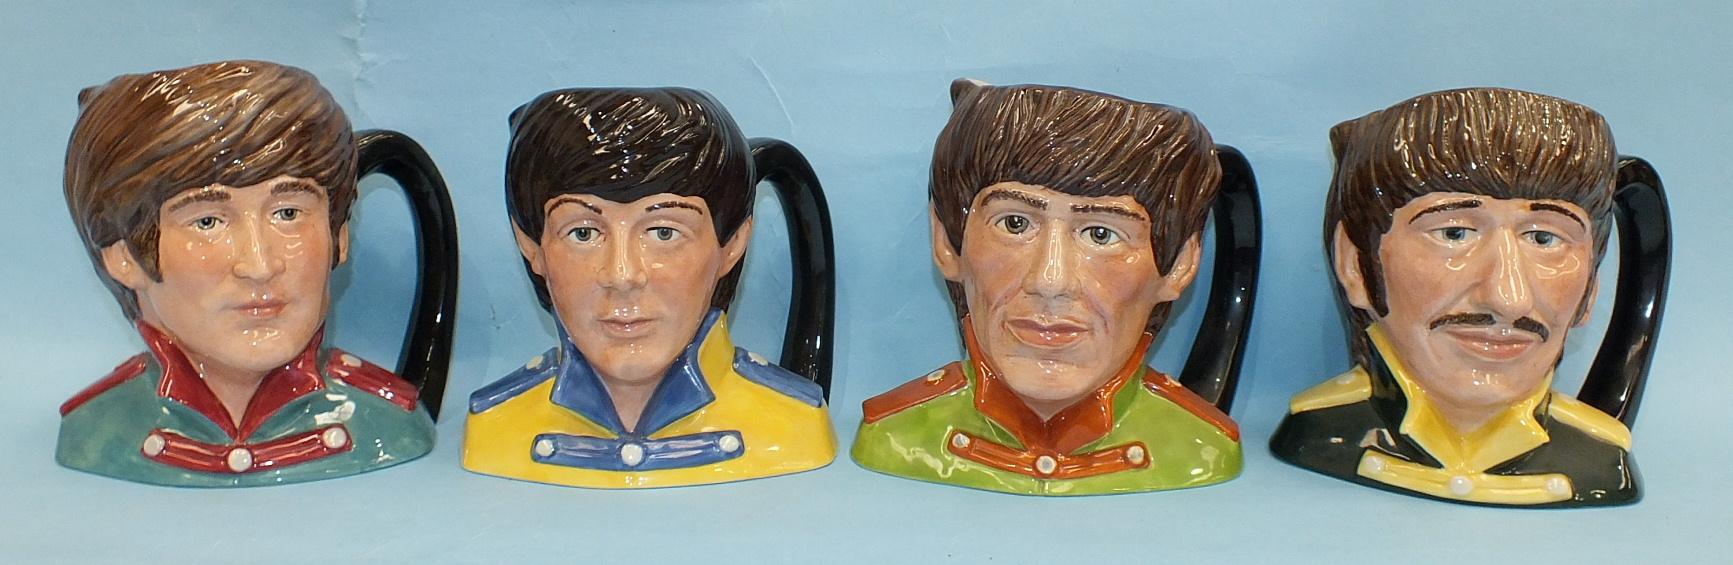 A set of four Royal Doulton 'The Beatles' character jugs, 'Paul McCartney' D6724, 'John Lennon'